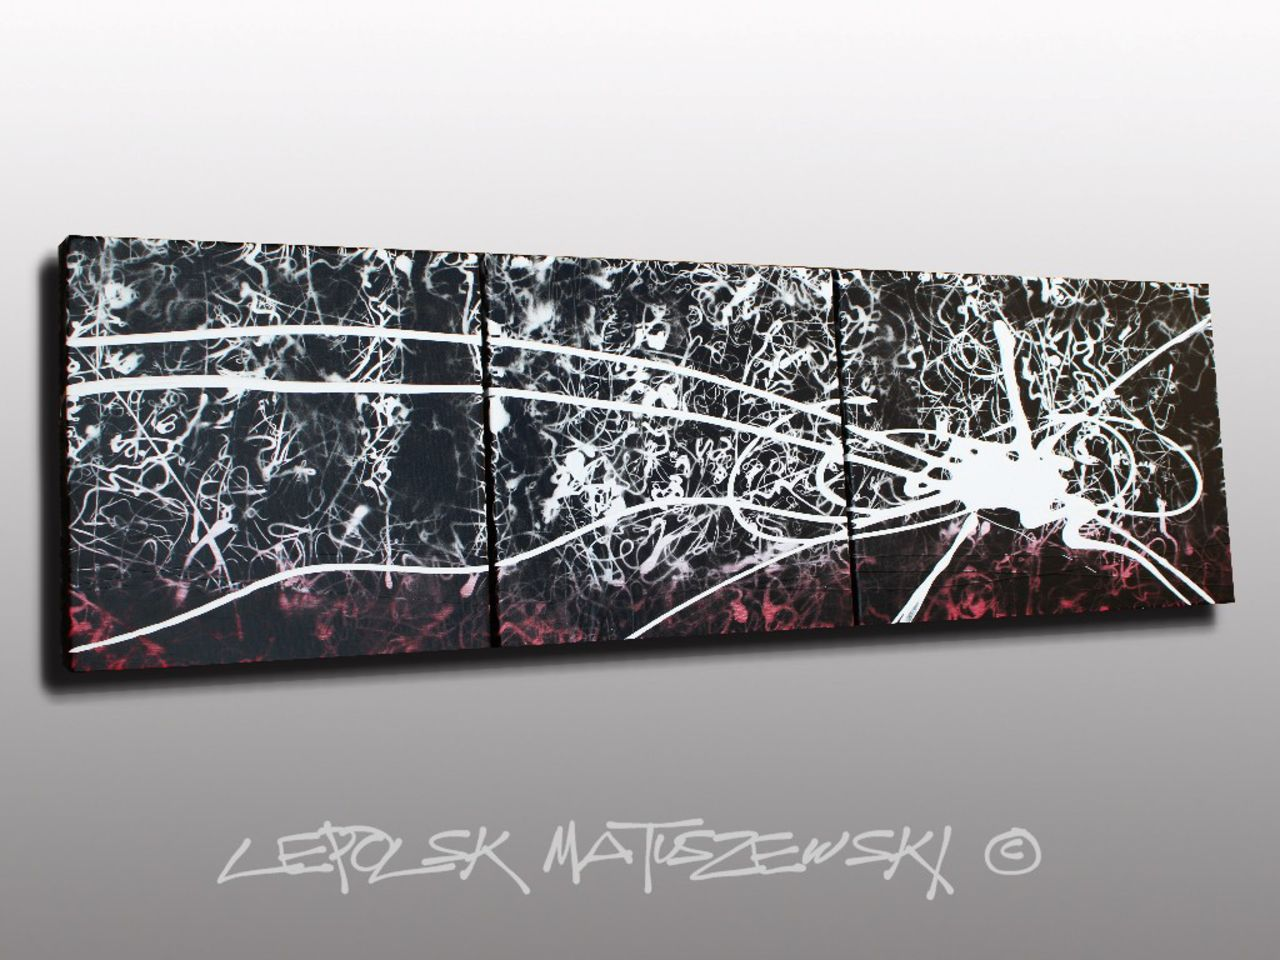 MK  Lepolsk Matuszewski INCANDESCENCE  Expressionnisme abstrait contemporain